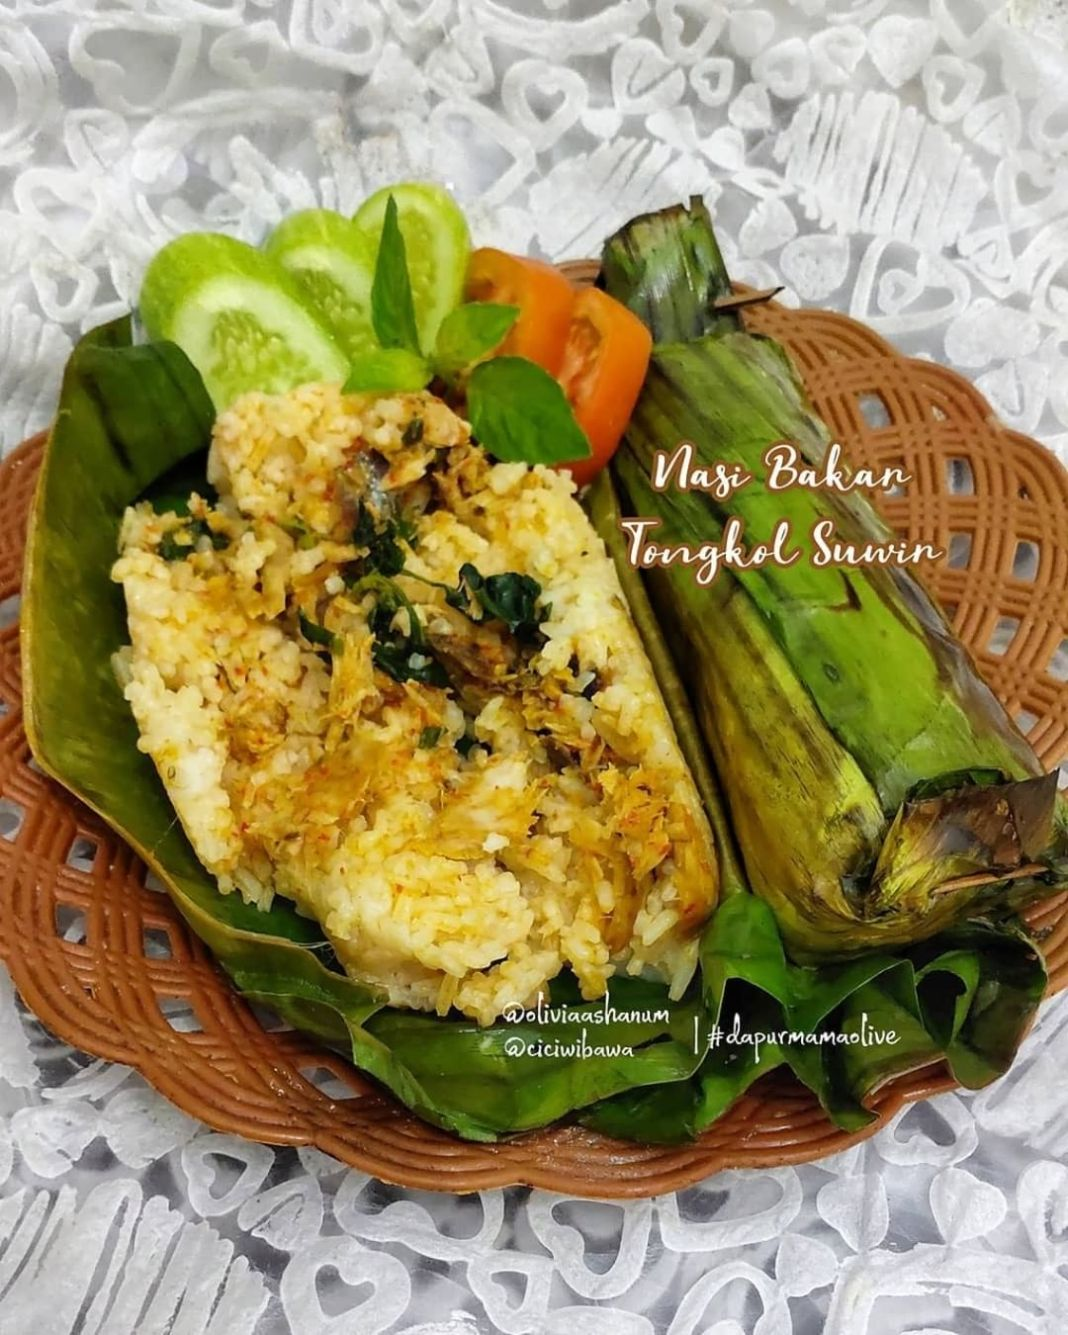 Info kuliner, ini enak banget sih di makan untuk buka puasa atau waktu lagi kumpul sama keluarga, cobain ya!  …